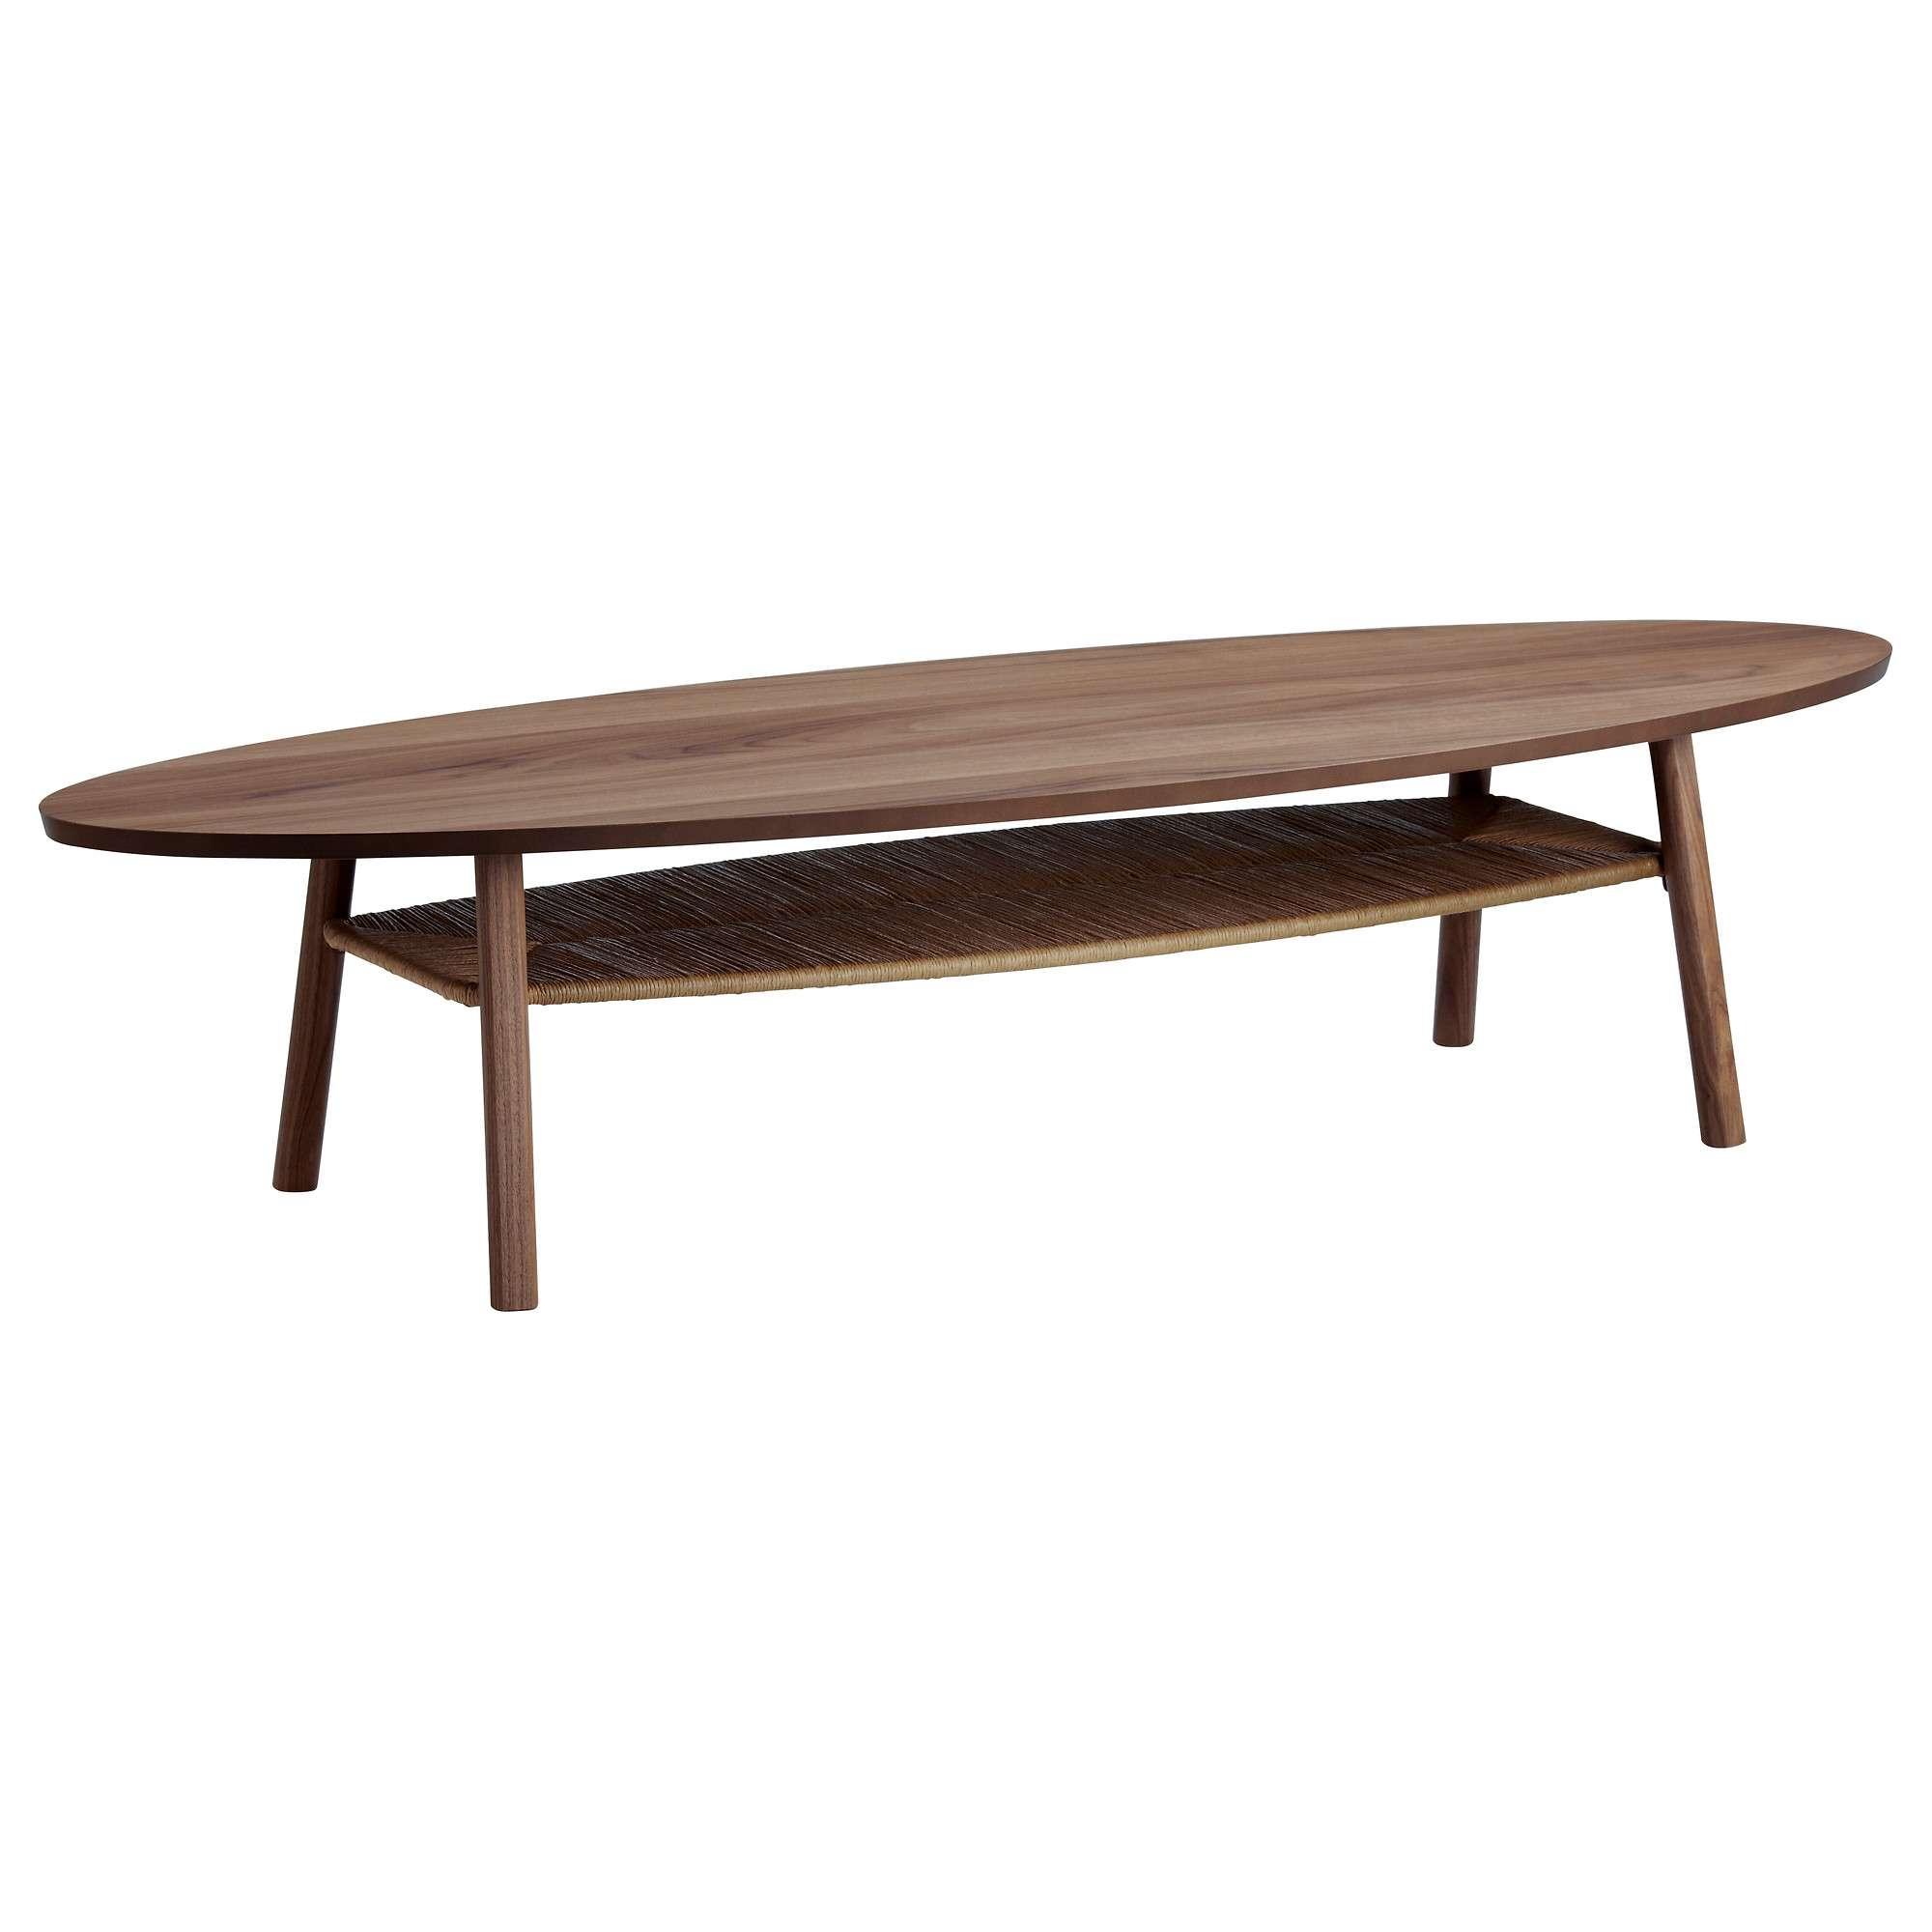 Favorite Oblong Coffee Tables Regarding Coffee Tables – Glass & Wooden Coffee Tables – Ikea (View 9 of 20)